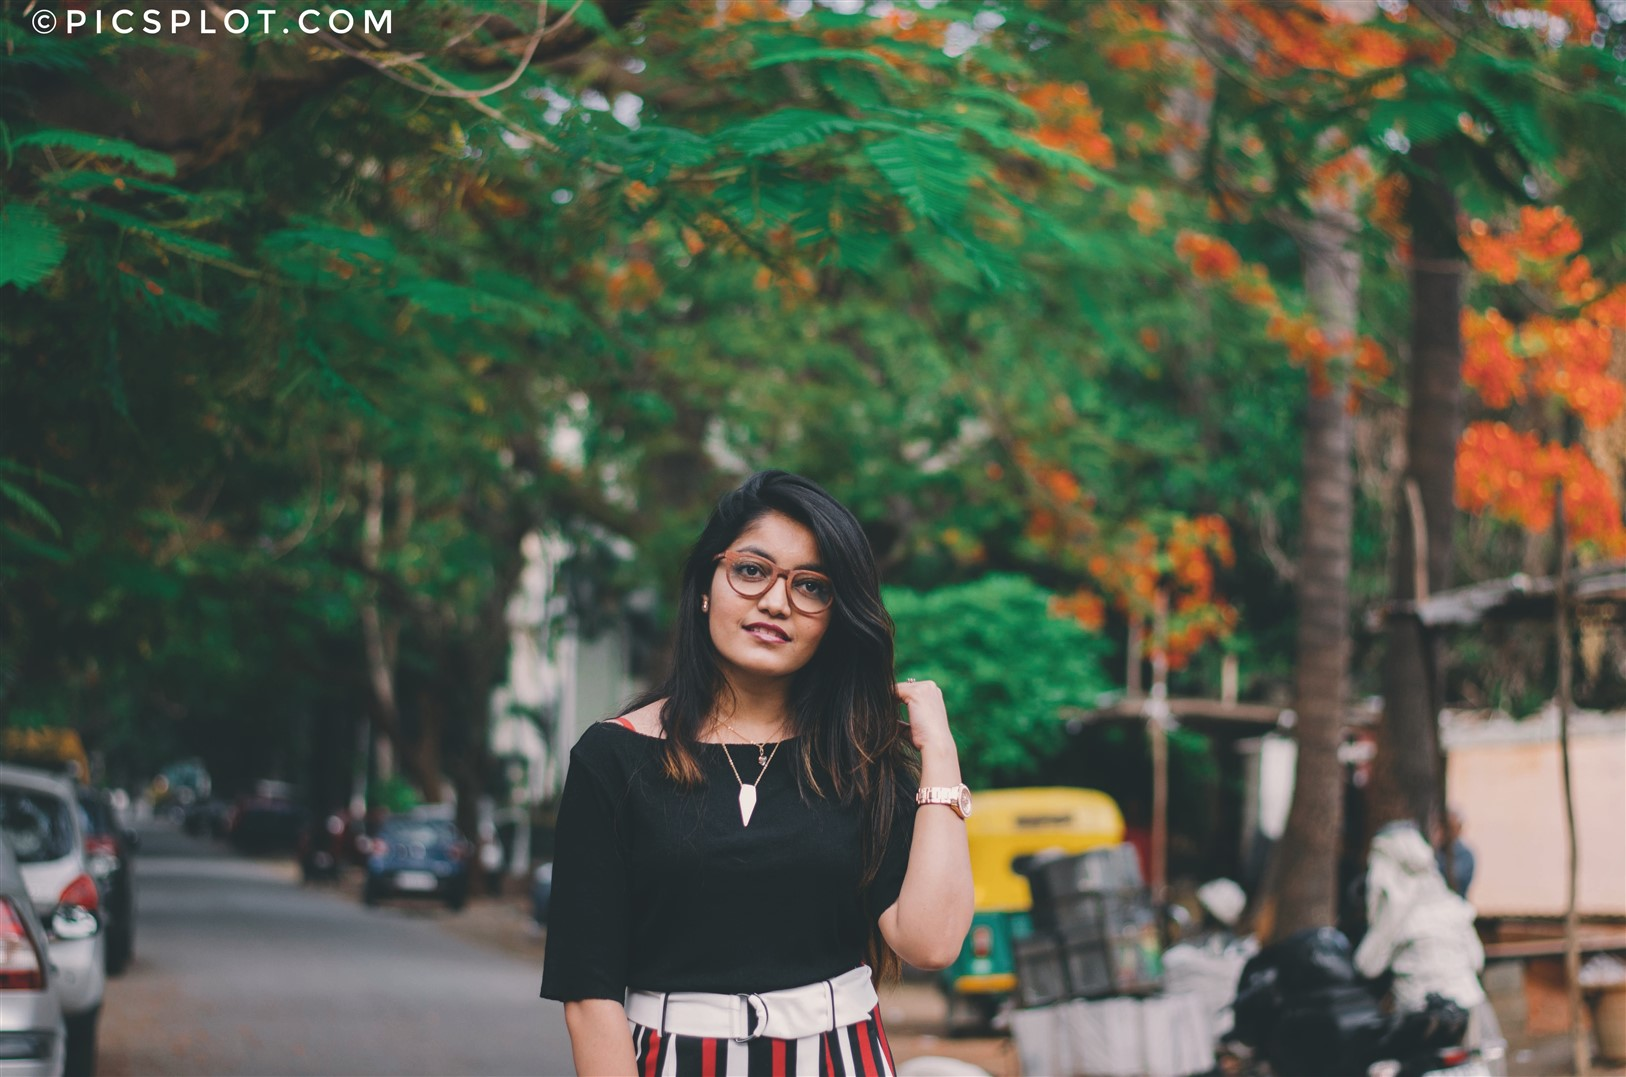 bangalore fashion blogger the jeromy diaries princy mascarenhas wearing rose wooden spectacles